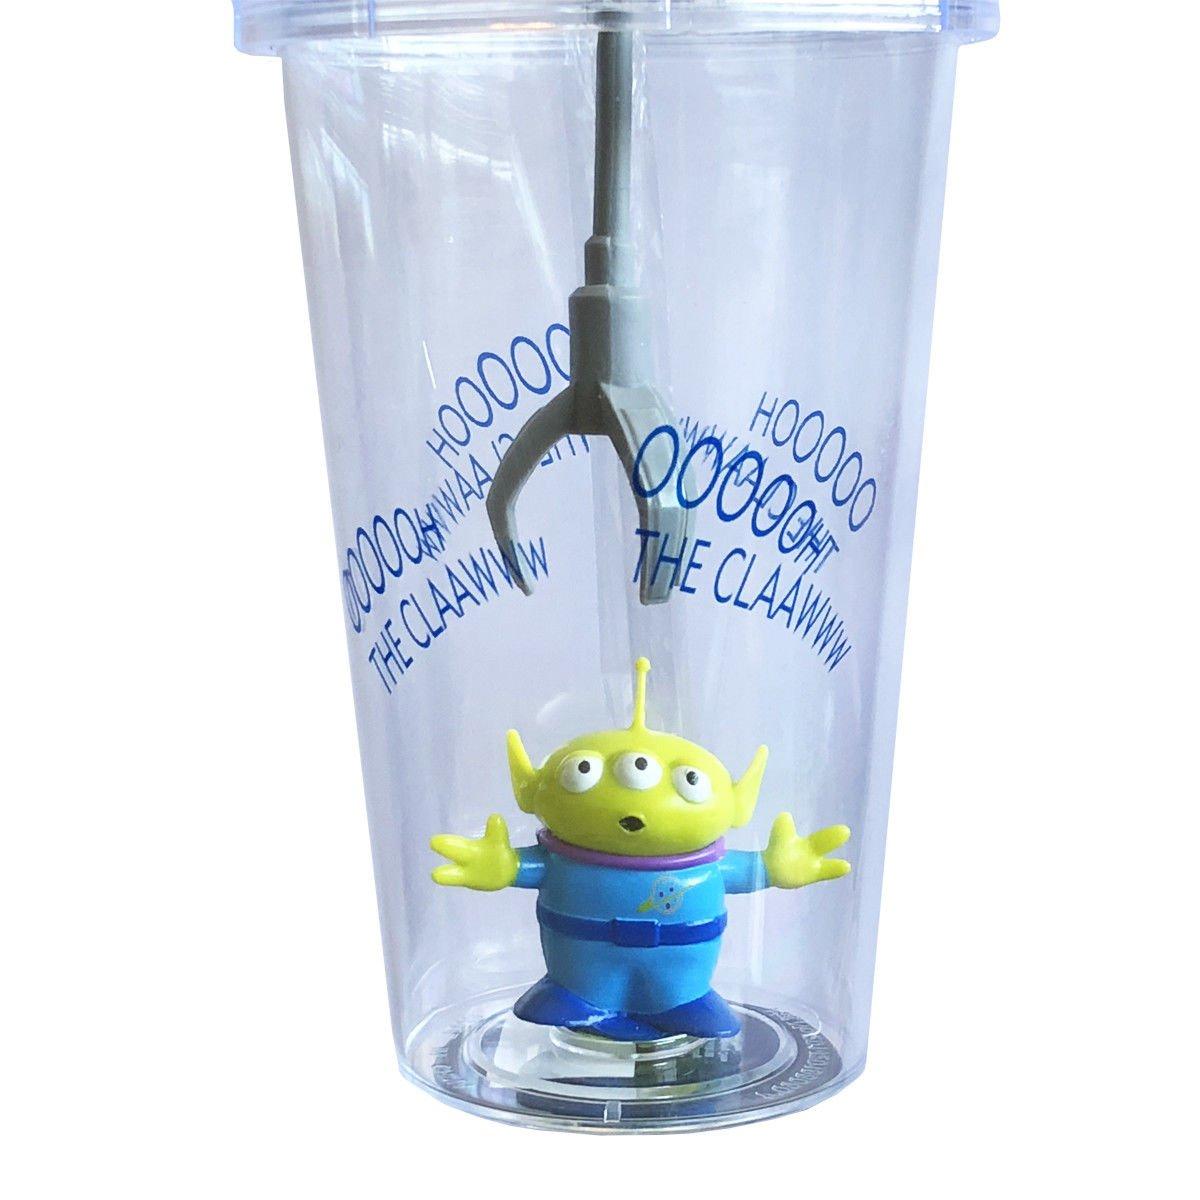 2018 Pixar Fest Disneyland Alien Toy Story Light Up Tour Mechandise Tumbler New Glassware Drinkware